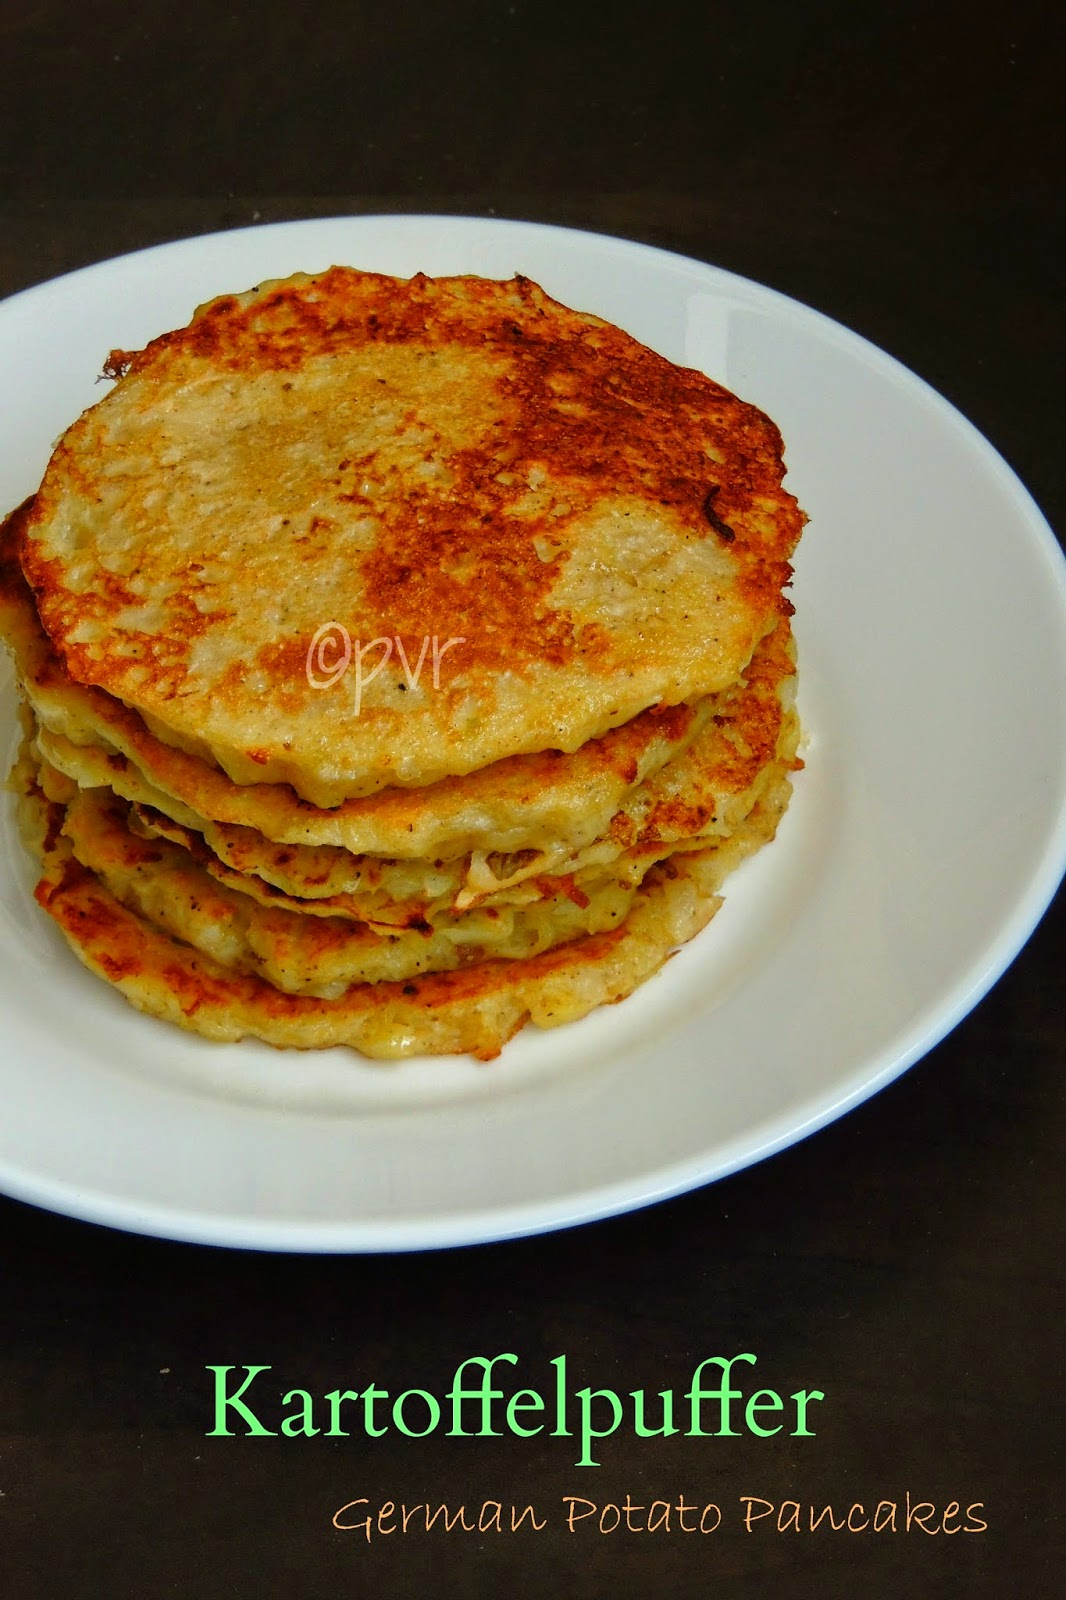 Kartoffelpuffer, Kartoffenkuche,Reibekuchen,German potato pancakes